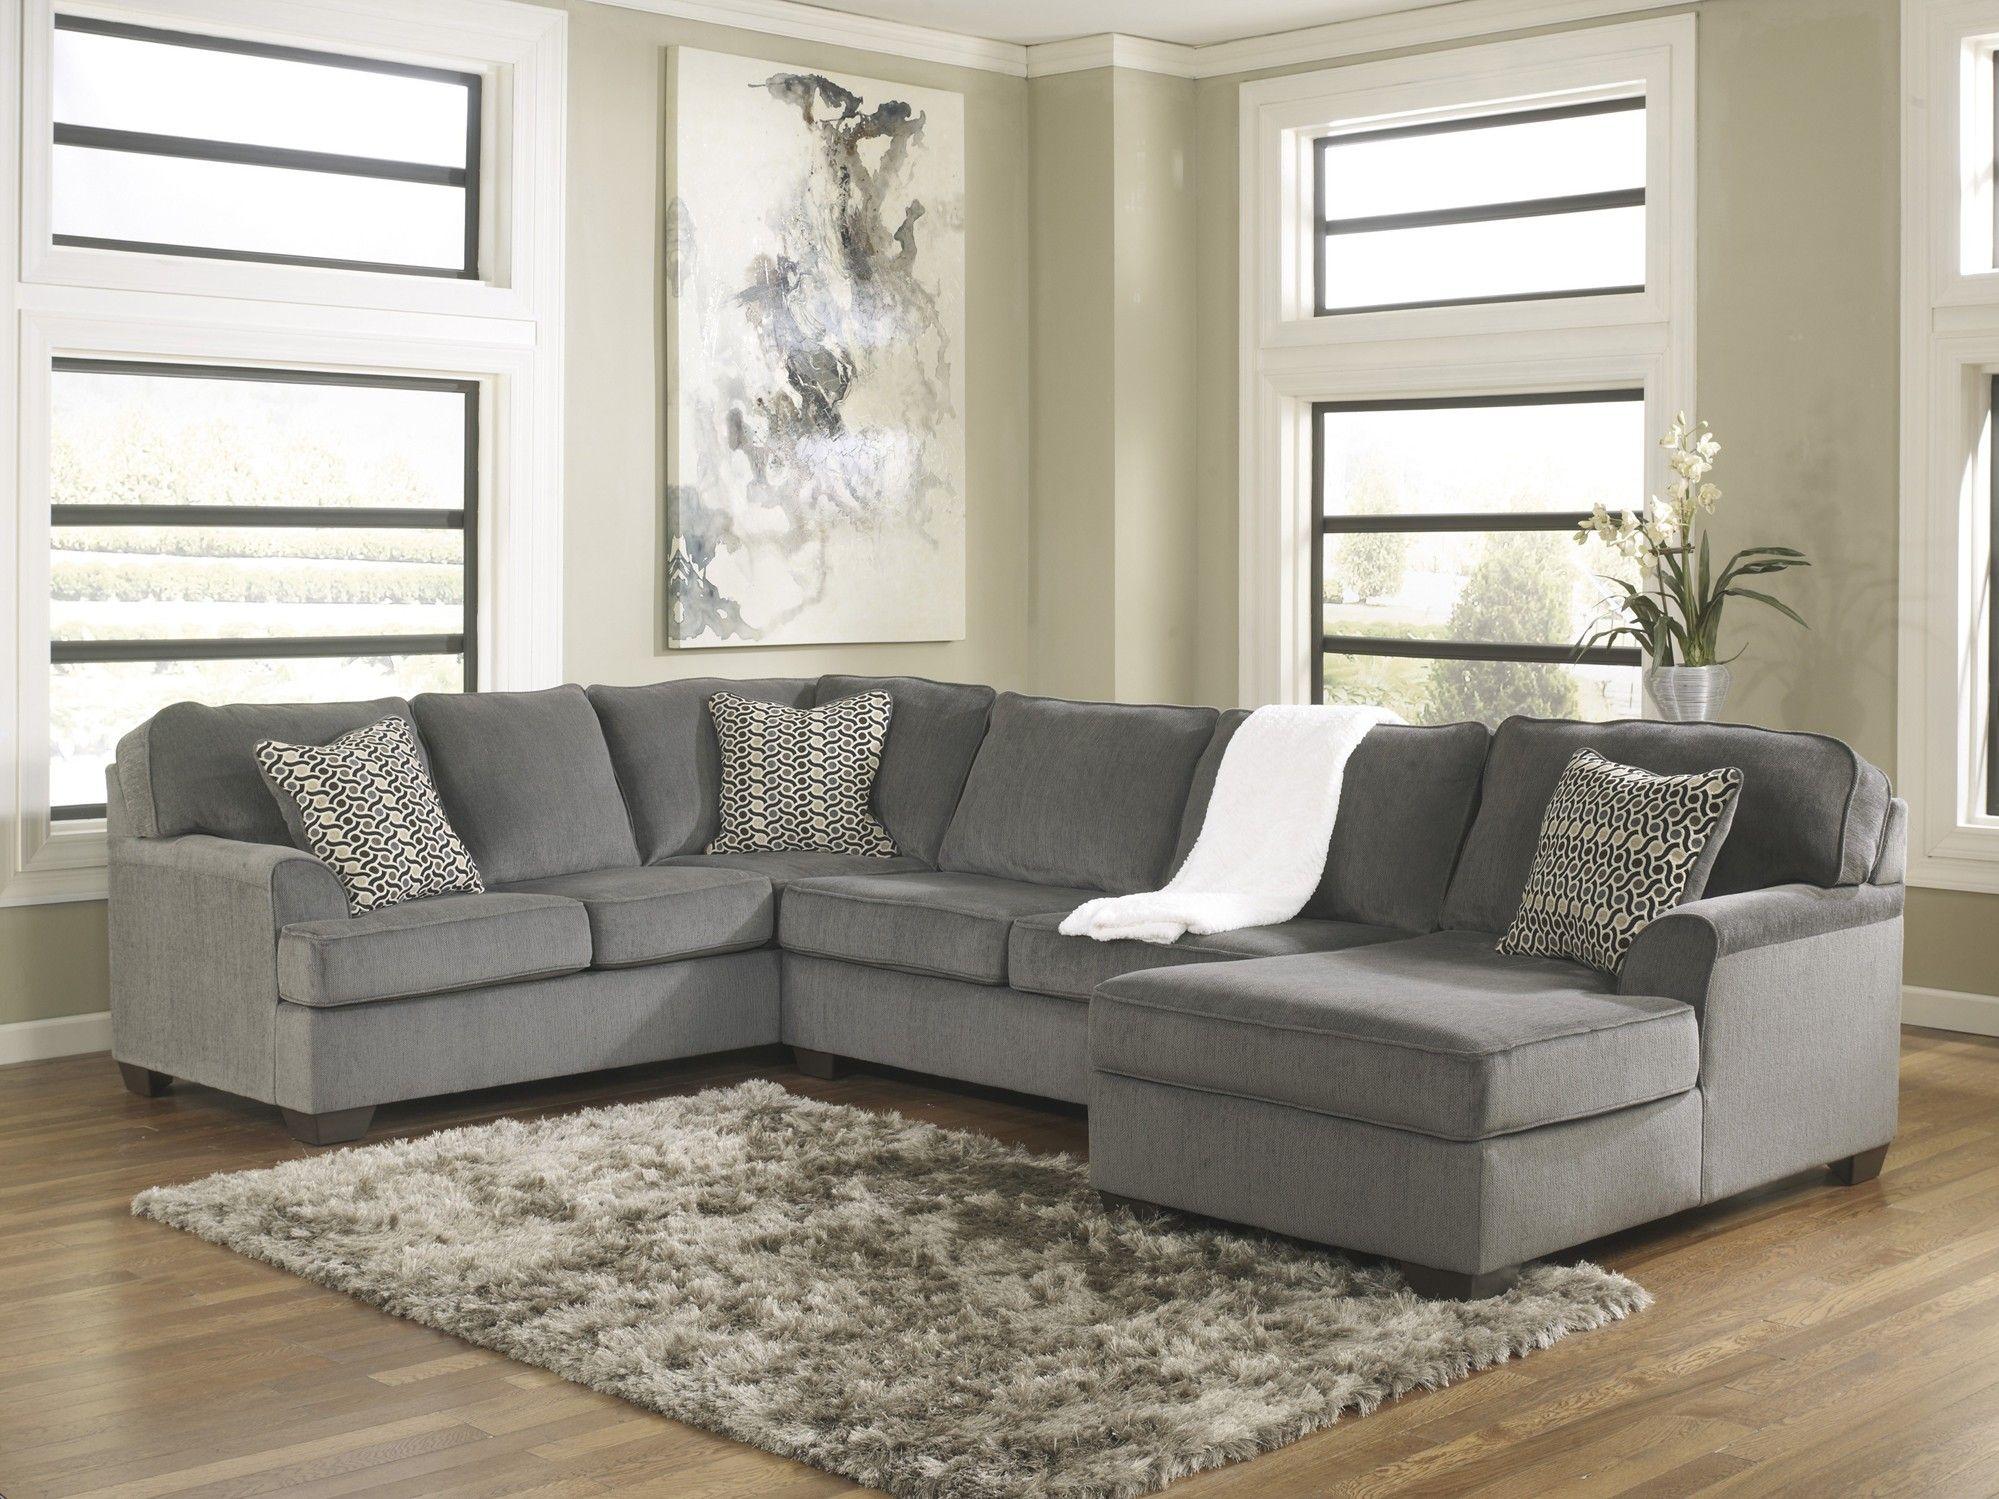 Loric Smoke 3 Piece Sectional Sofa Affordable Furniture Furniture Living Room Furniture